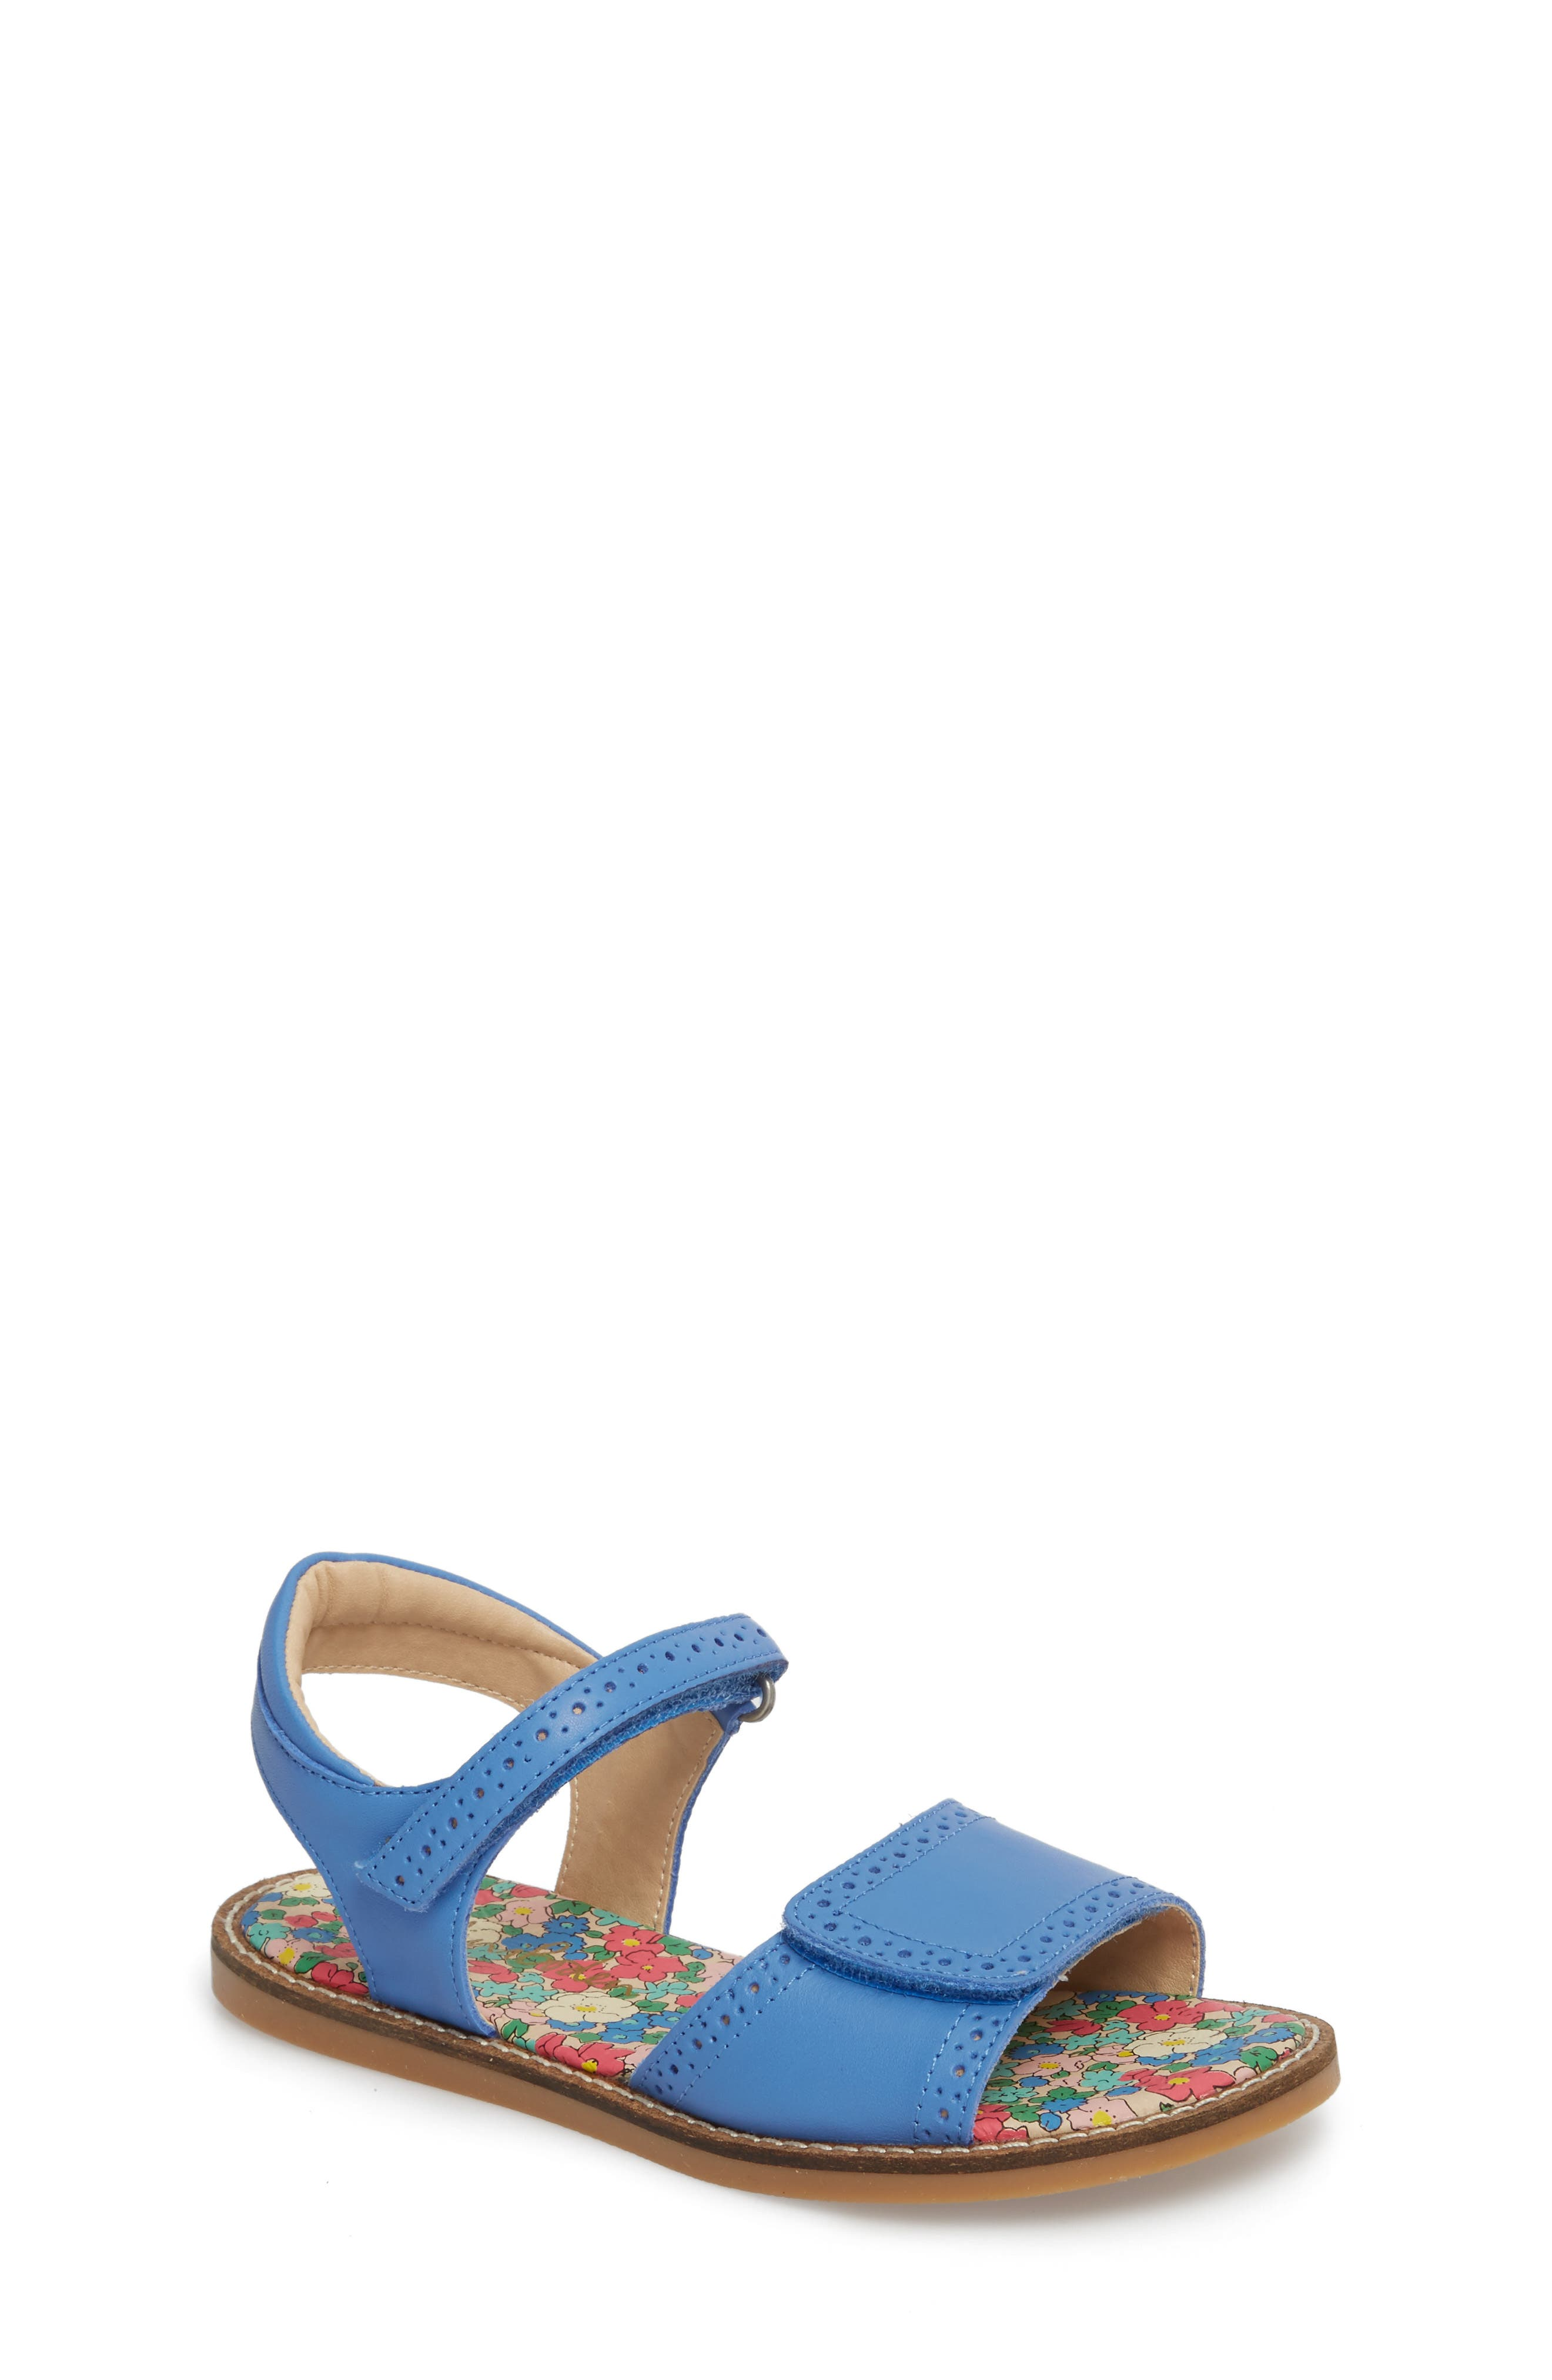 Adjustable Quarter Strap Sandal,                             Main thumbnail 1, color,                             Penzance Blue